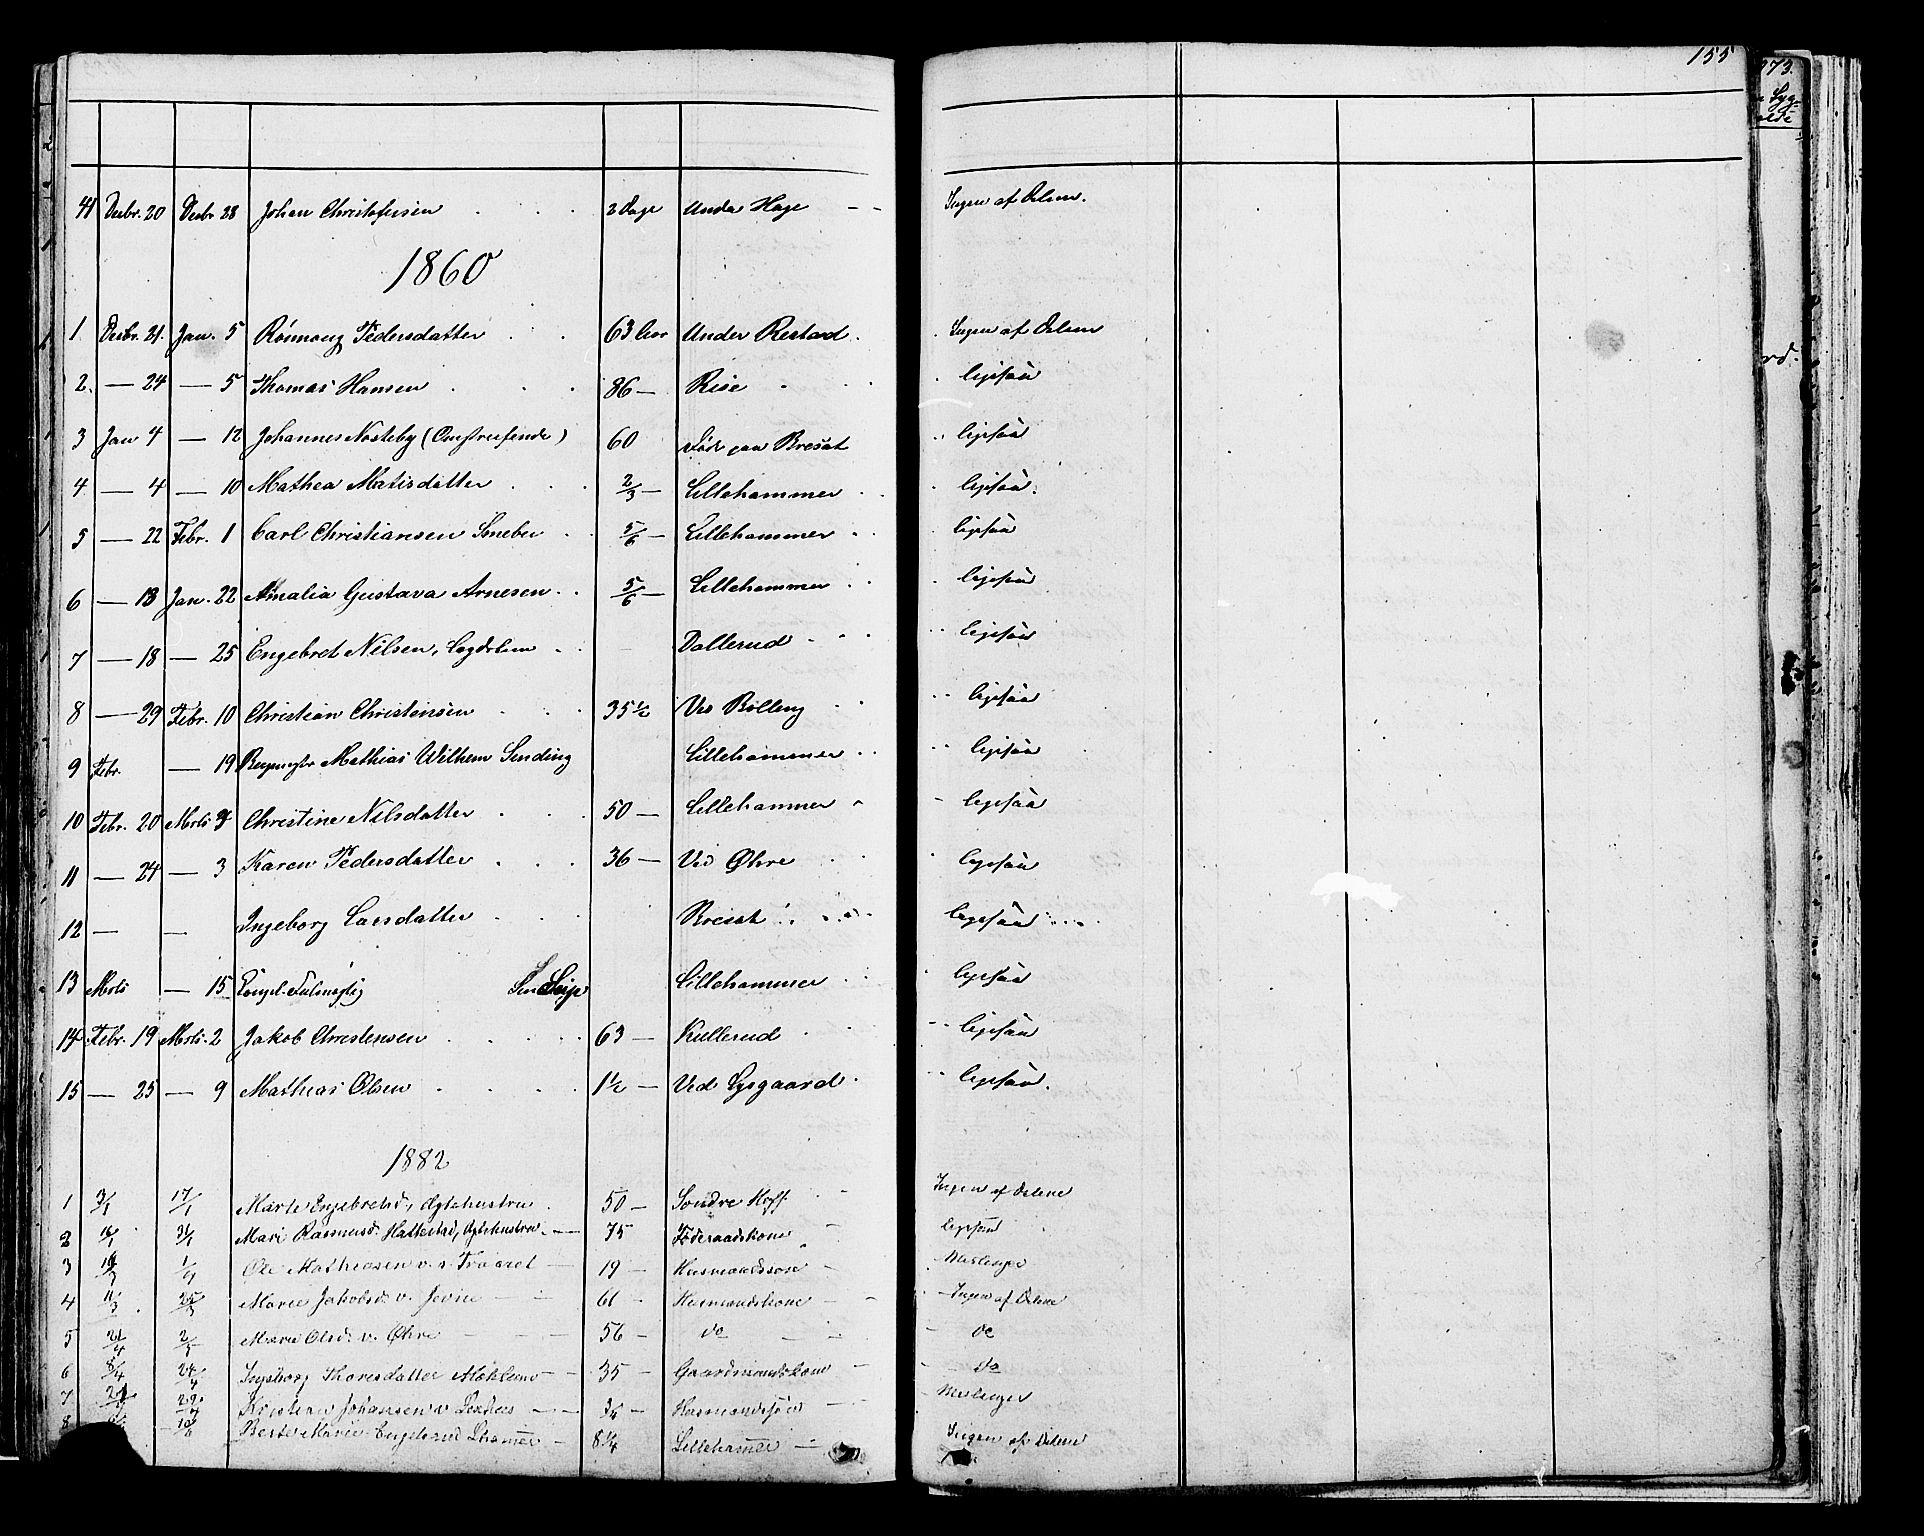 SAH, Fåberg prestekontor, Klokkerbok nr. 7, 1856-1891, s. 1054-1055